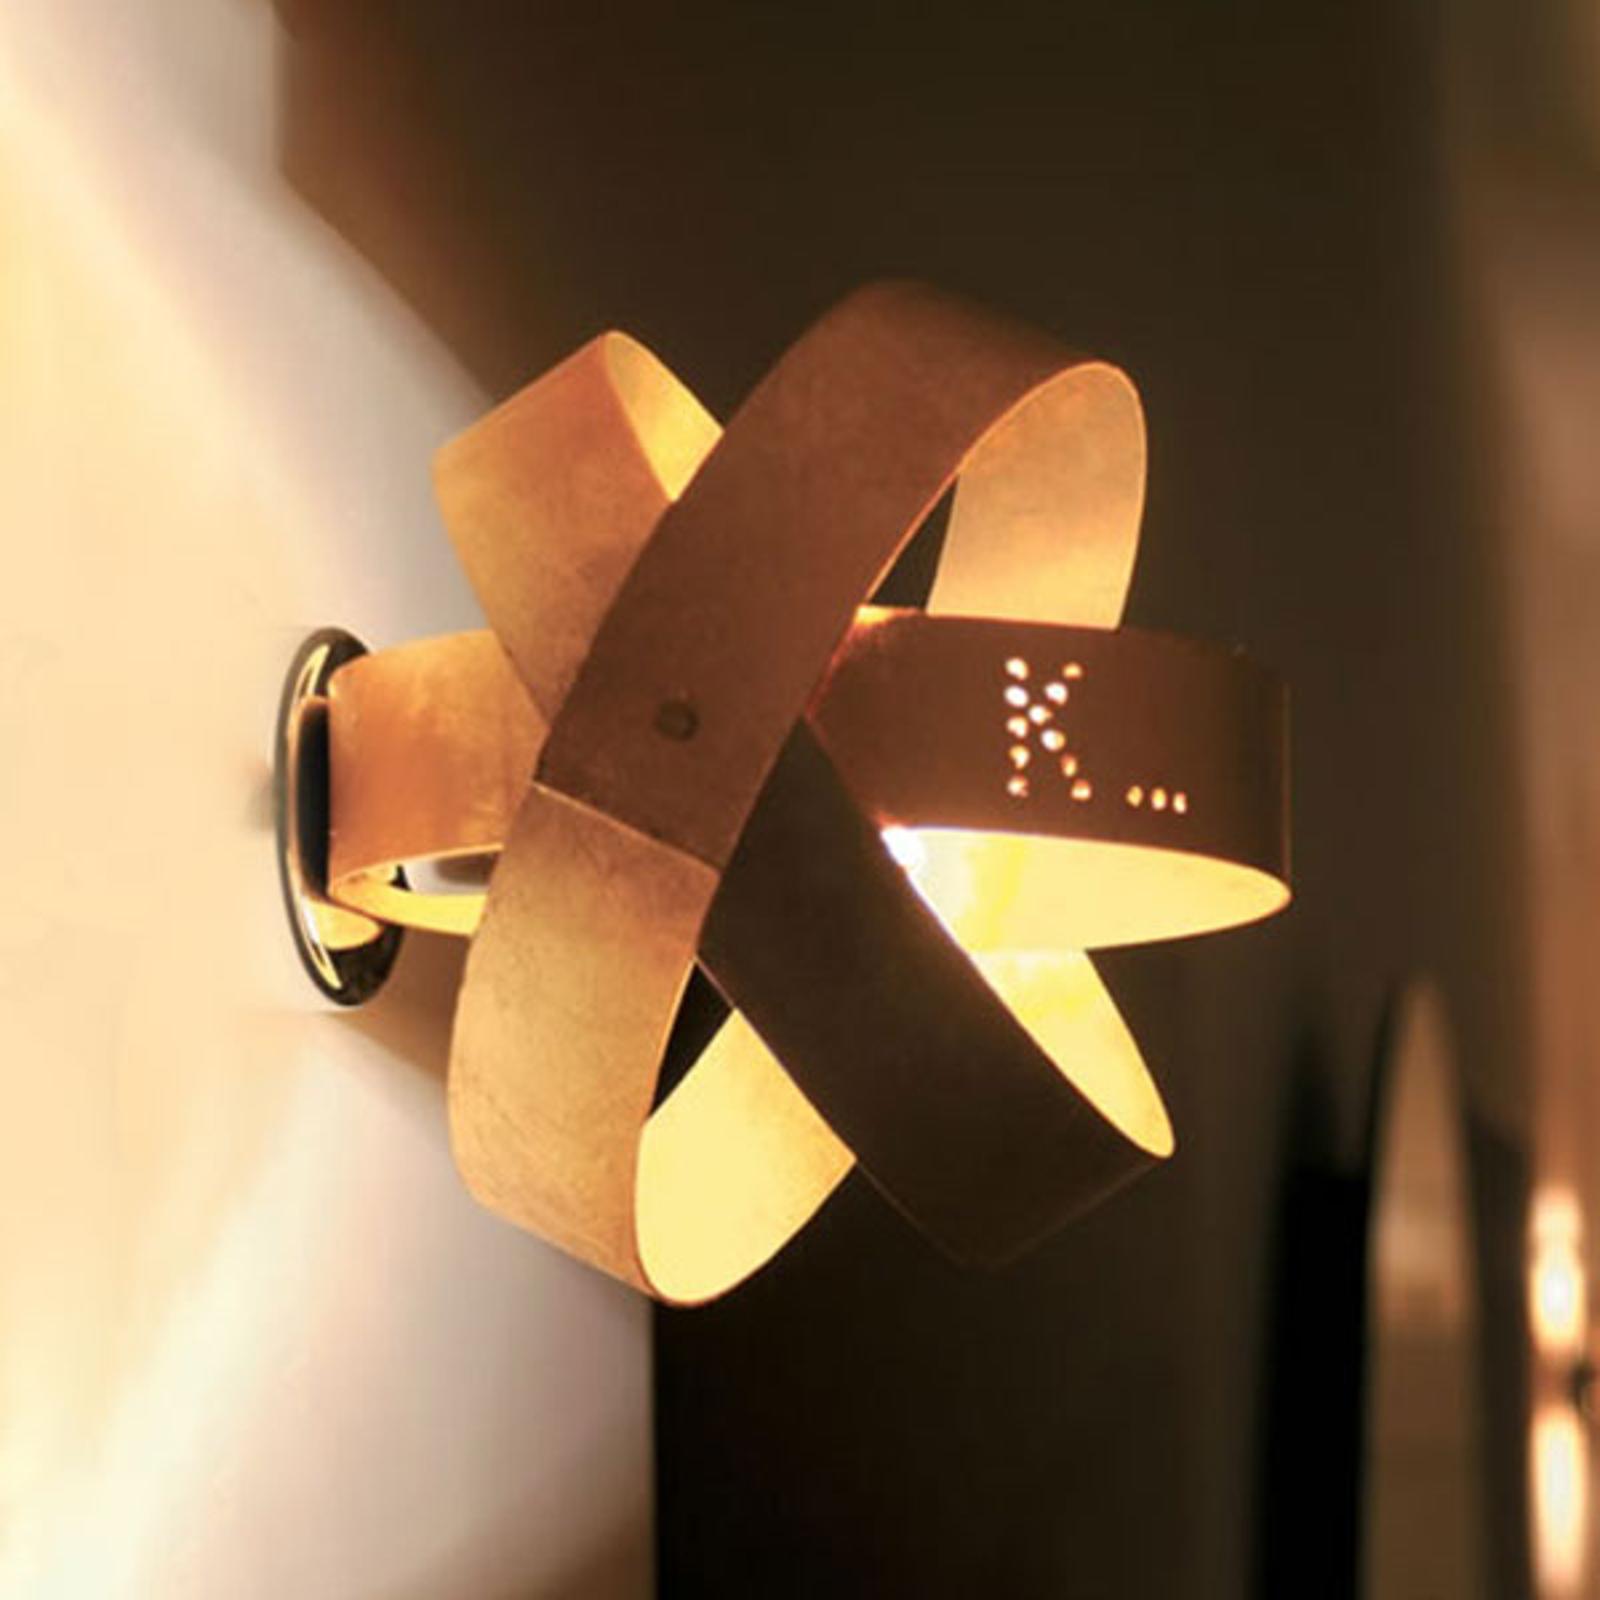 Knikerboker Ecliptika goldfarbene LED-Wandleuchte